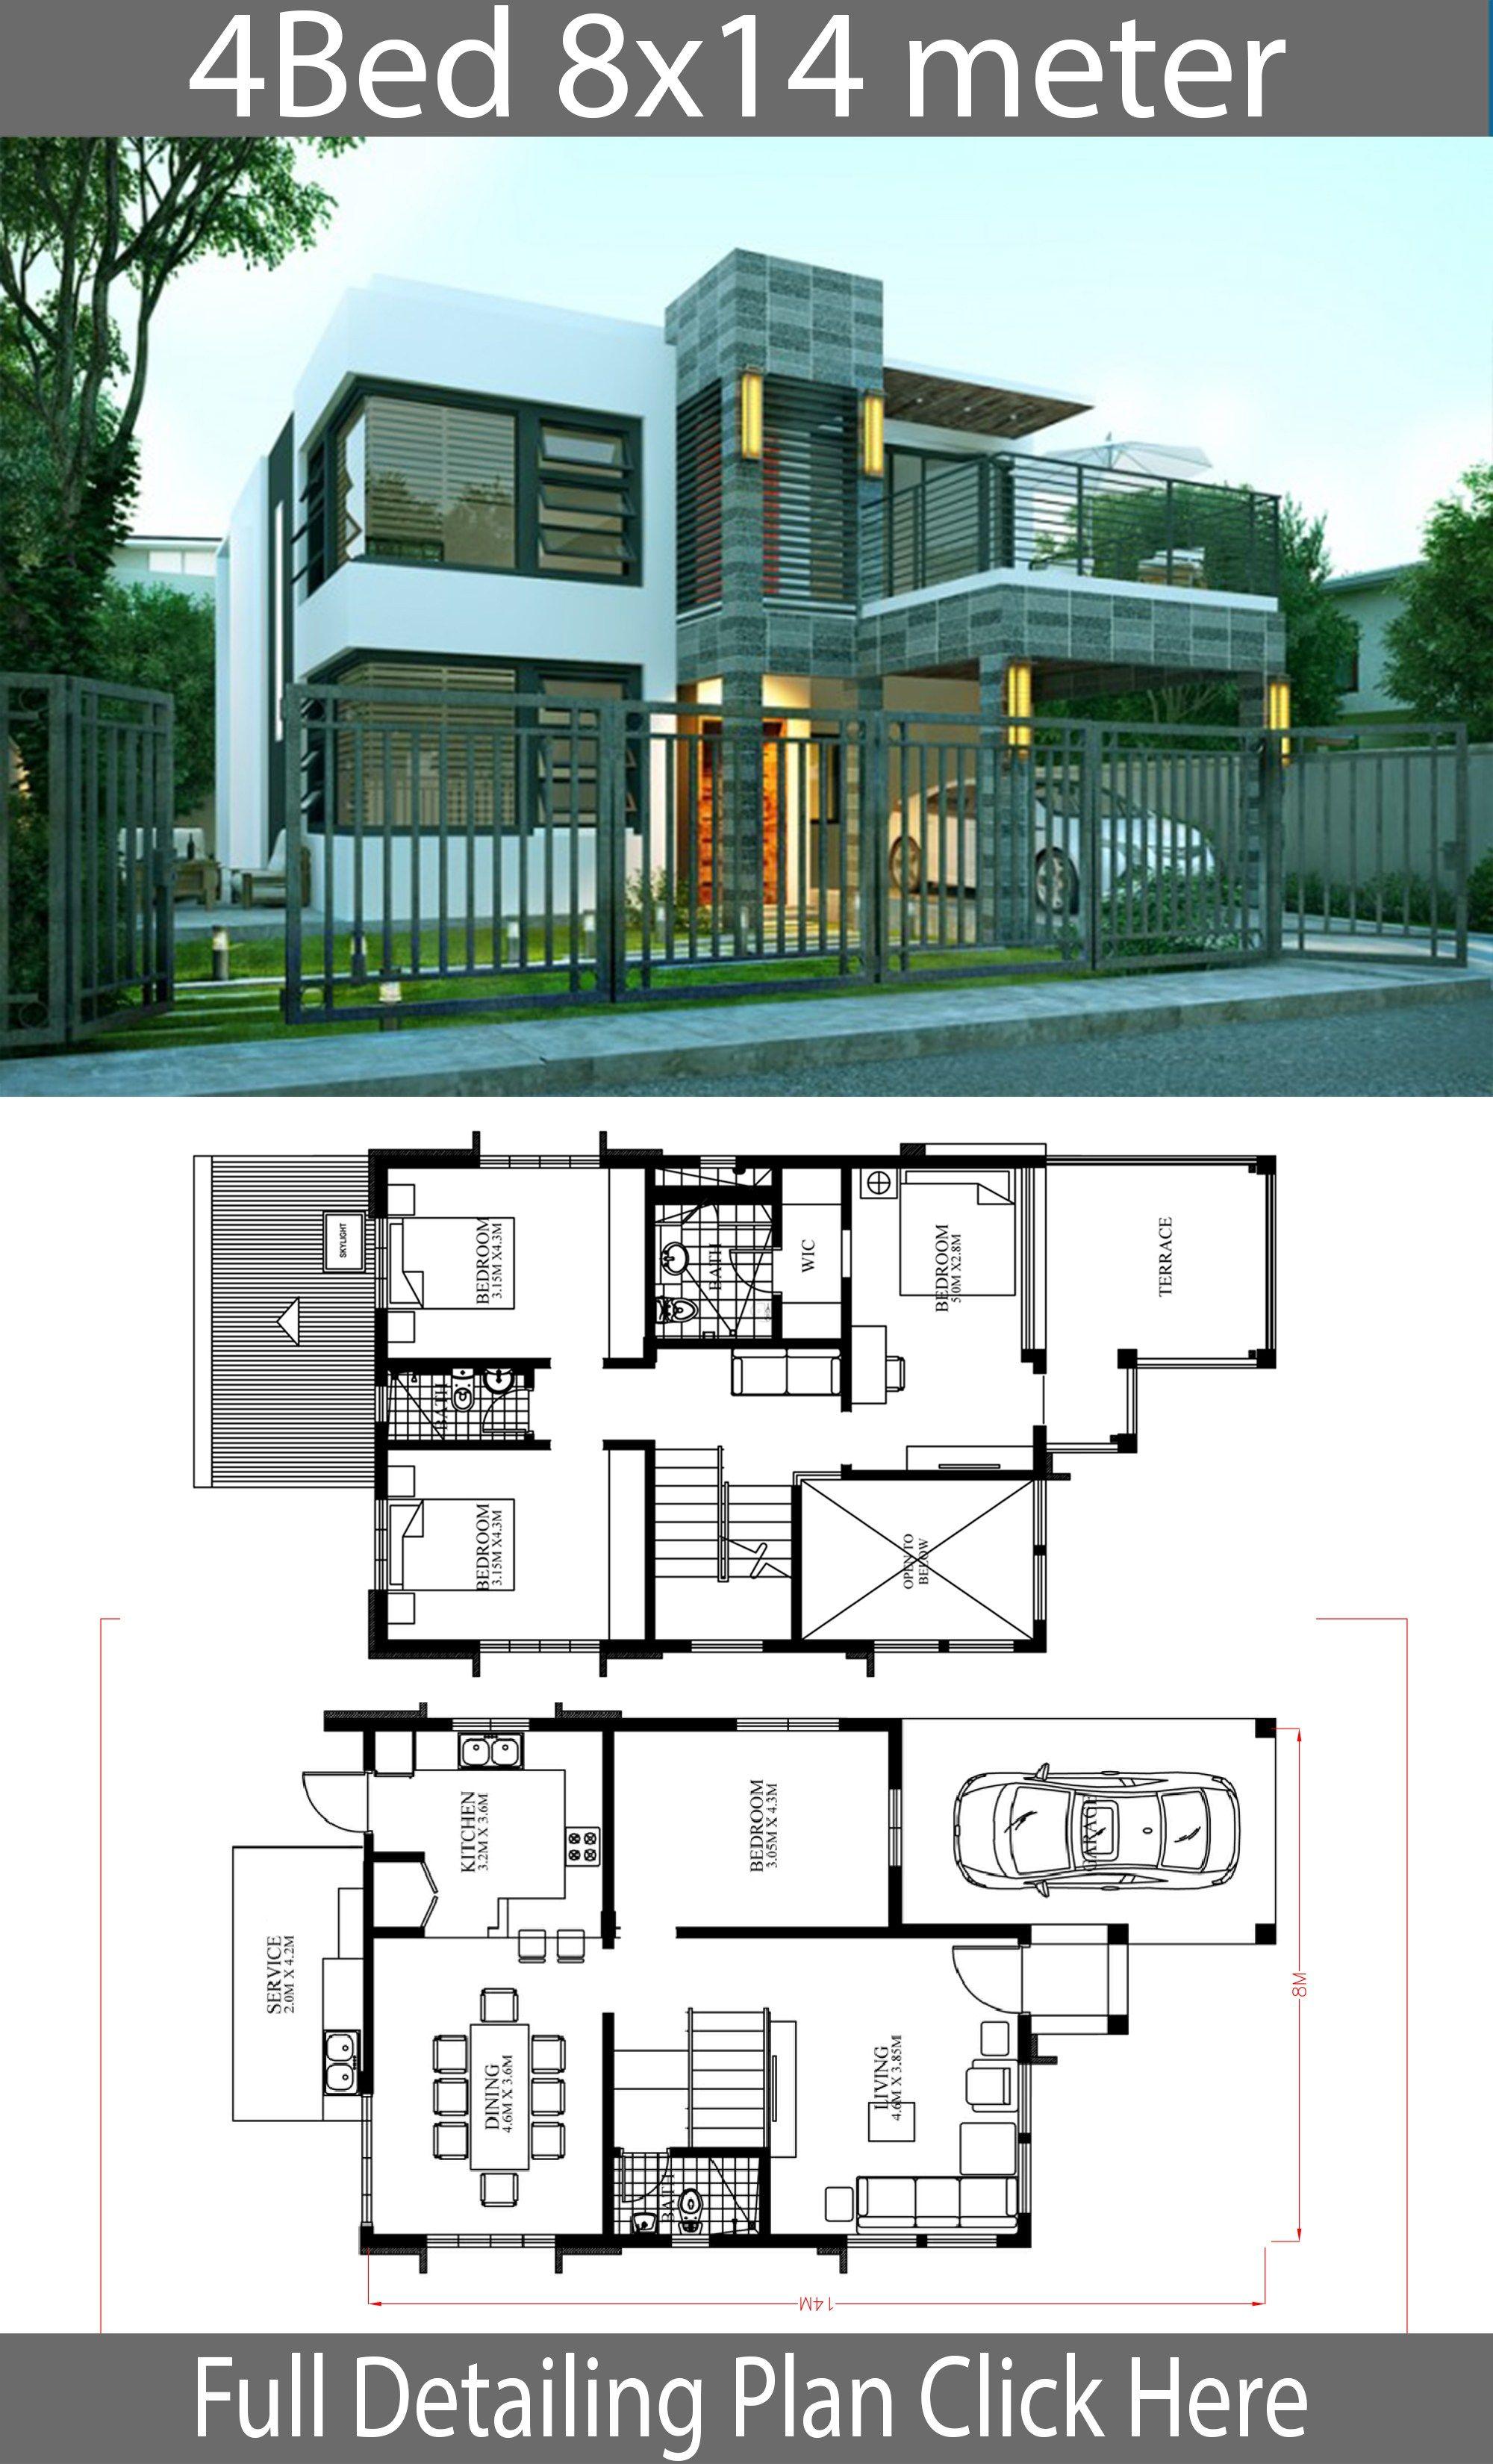 Plan De Maison Moderne home design plan 8x14m with 4 bedrooms | plan maison moderne